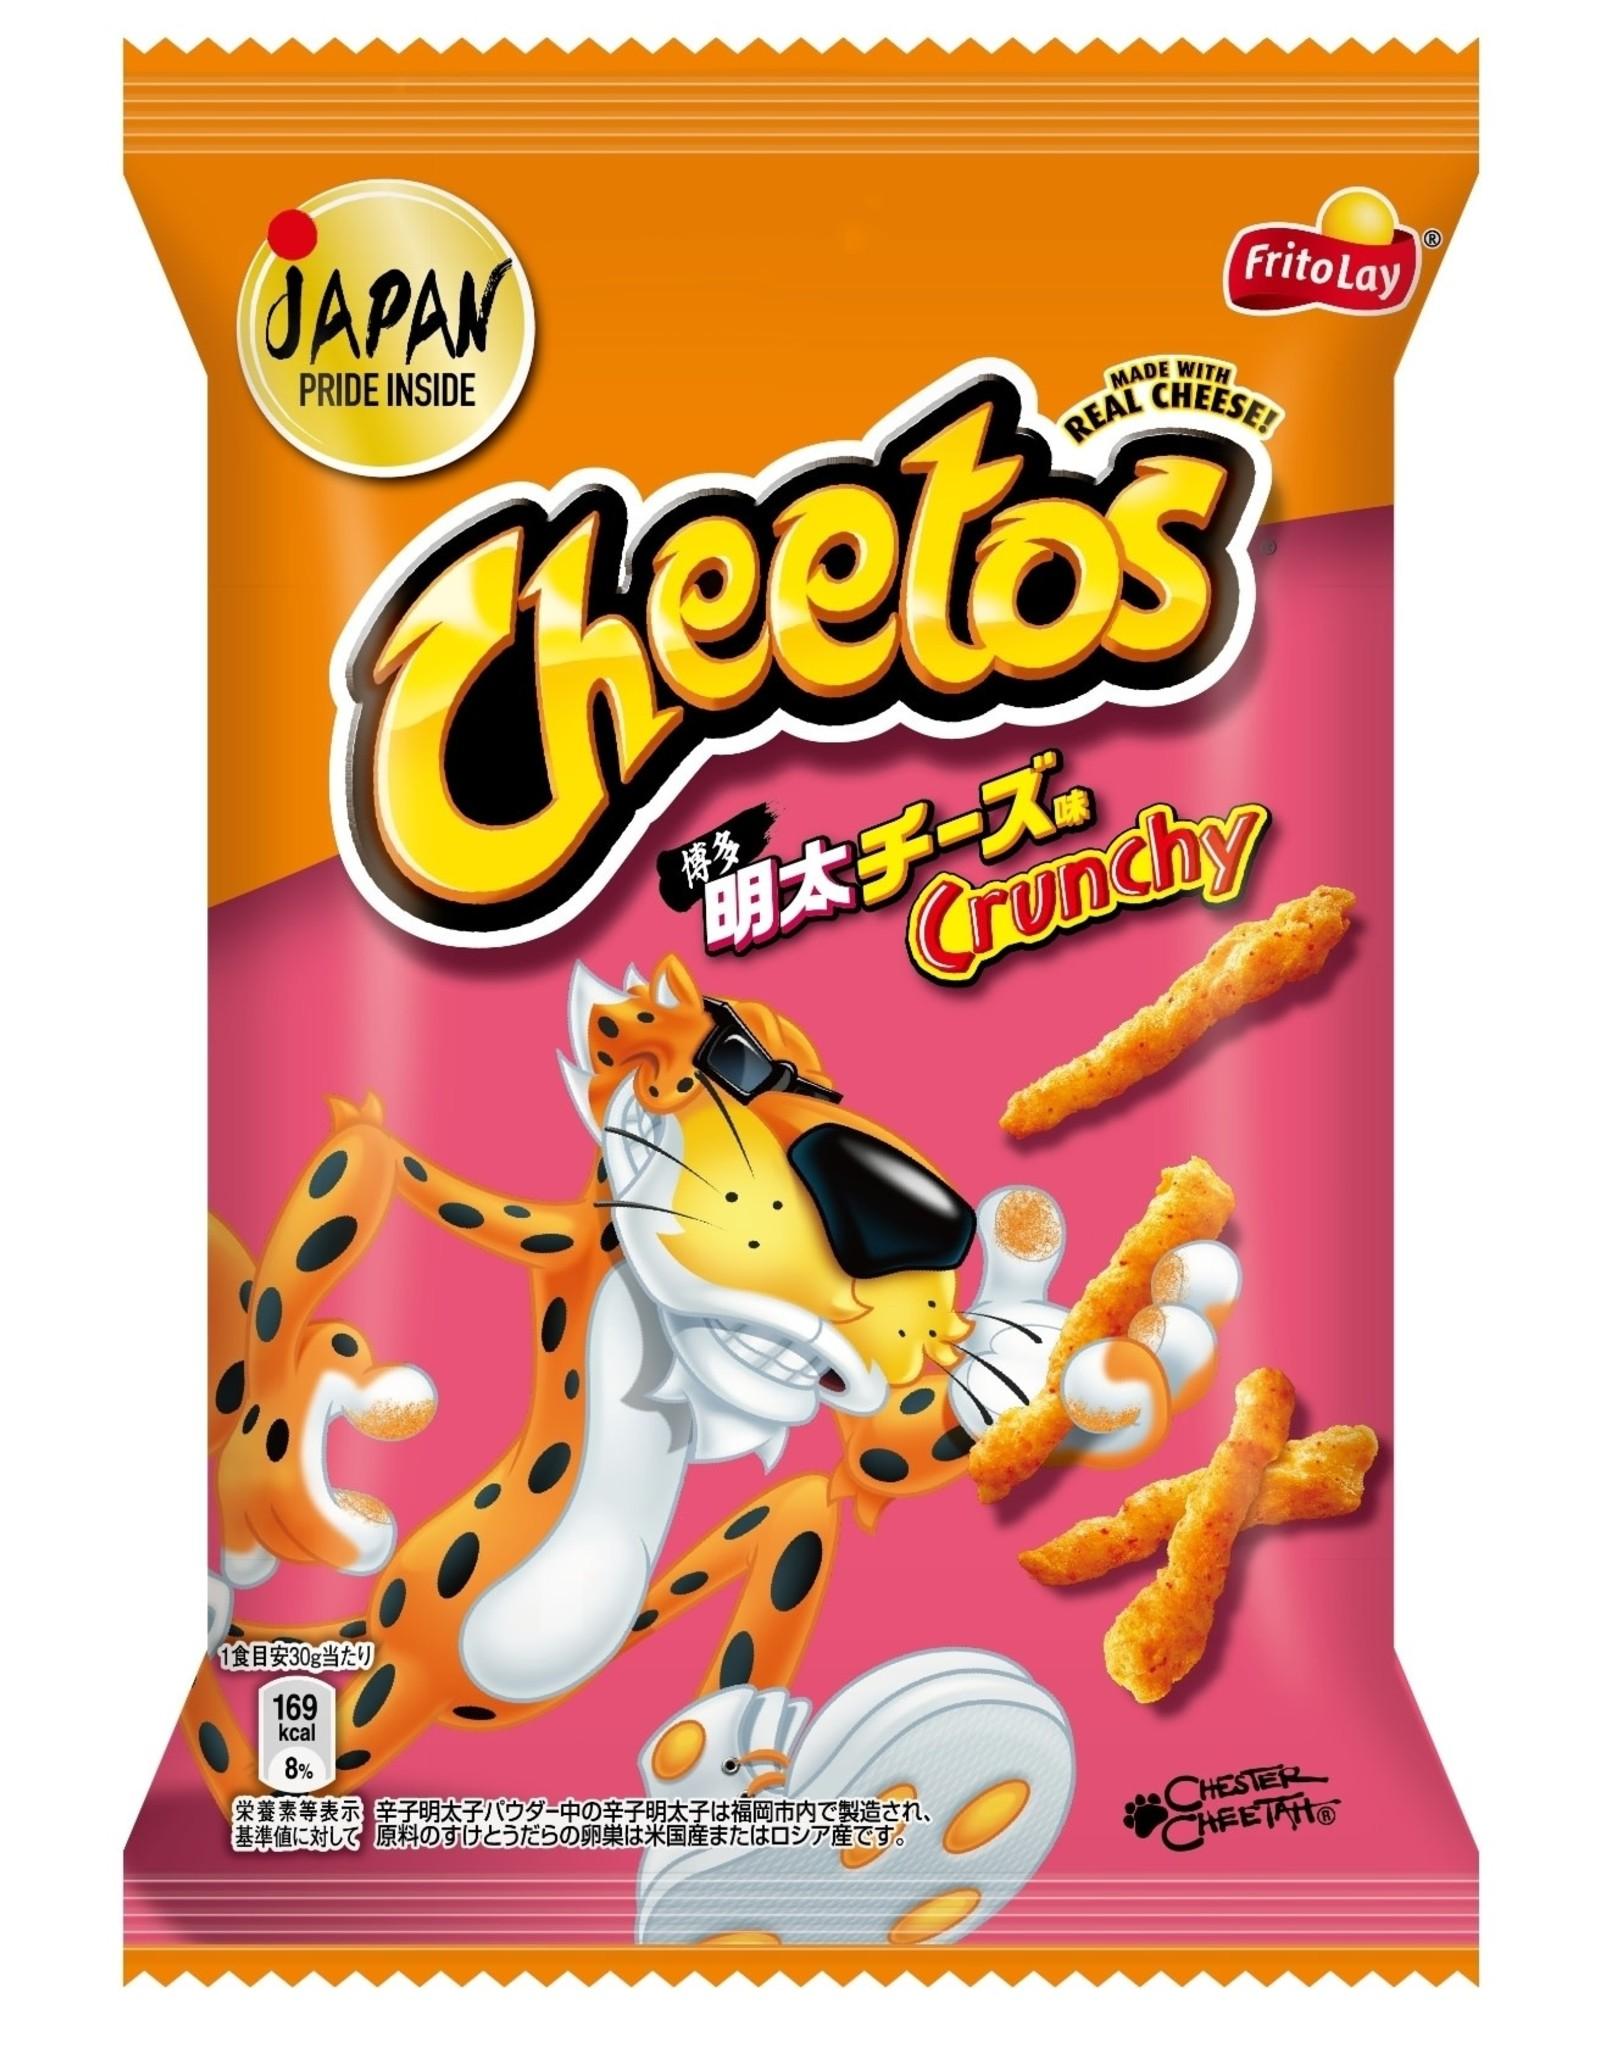 Cheetos Hakata Mentai-Cheese (Japan Exclusive) - 65g